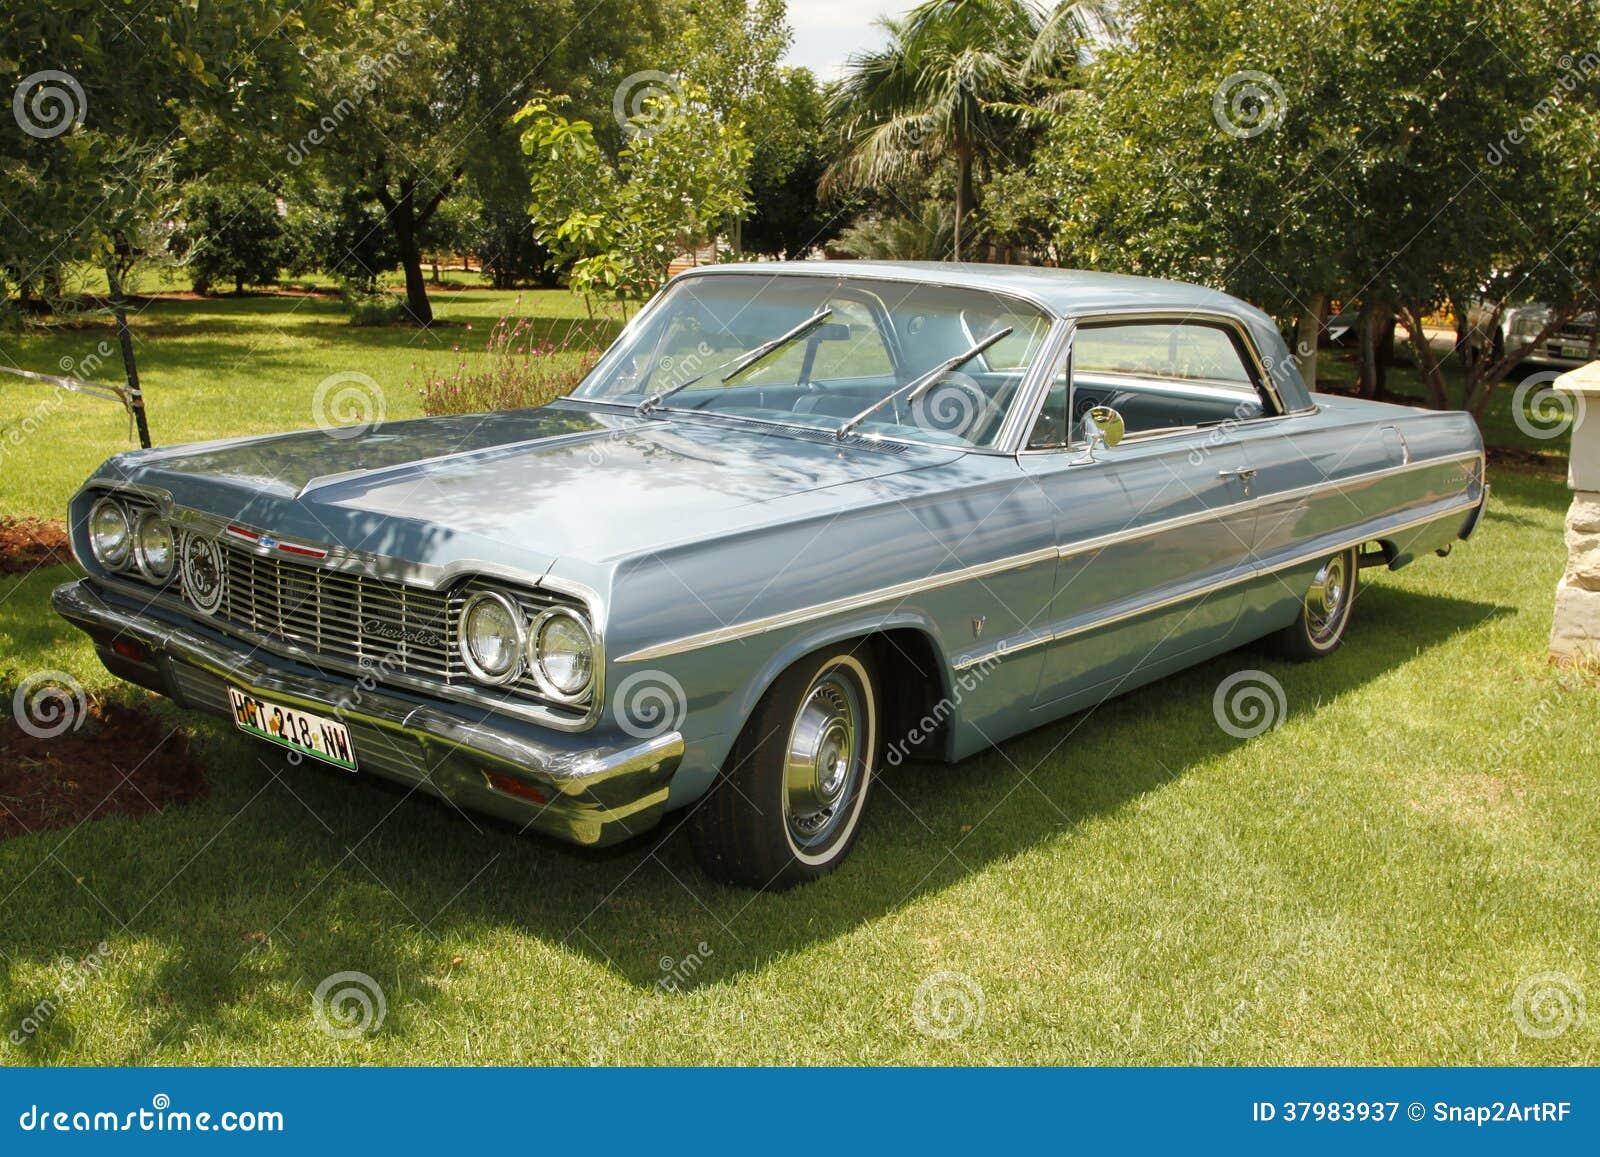 Used 2014 Chevy Impala >> Vintage Car 1964 Chevrolet Impala Coupe Editorial Photography - Image: 37983937